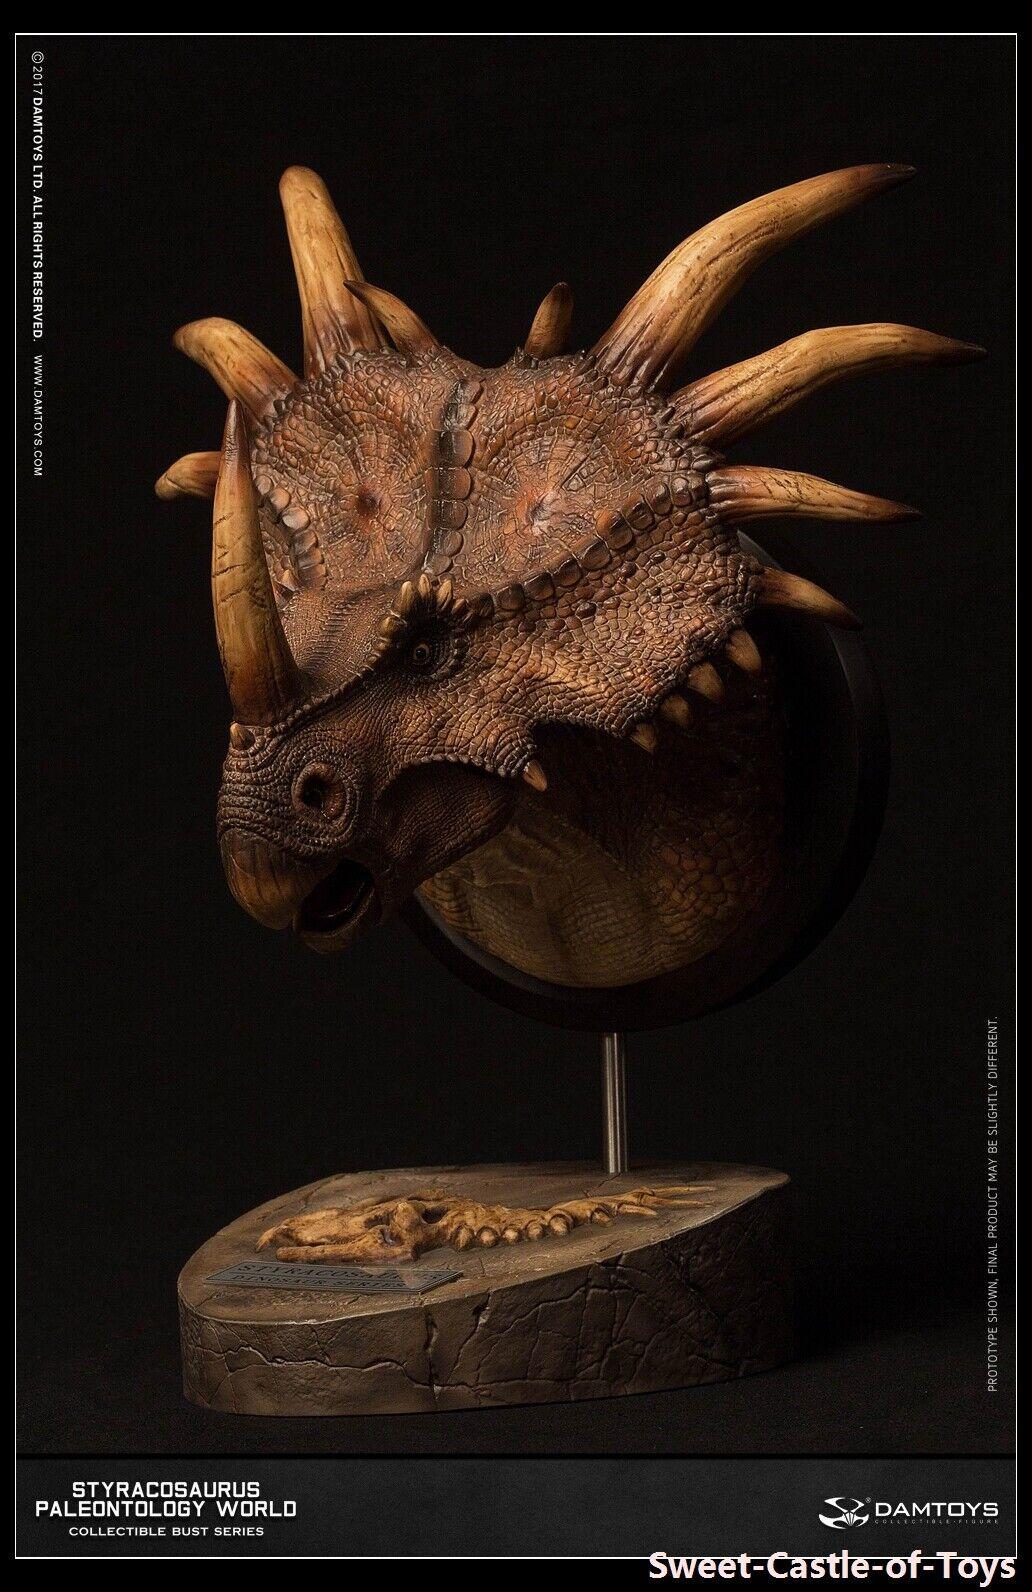 1 6 DAM Museum Series Stracosaurus autoautobust  Collectible Statue Marroneee Ver. MUS004B  vendita online